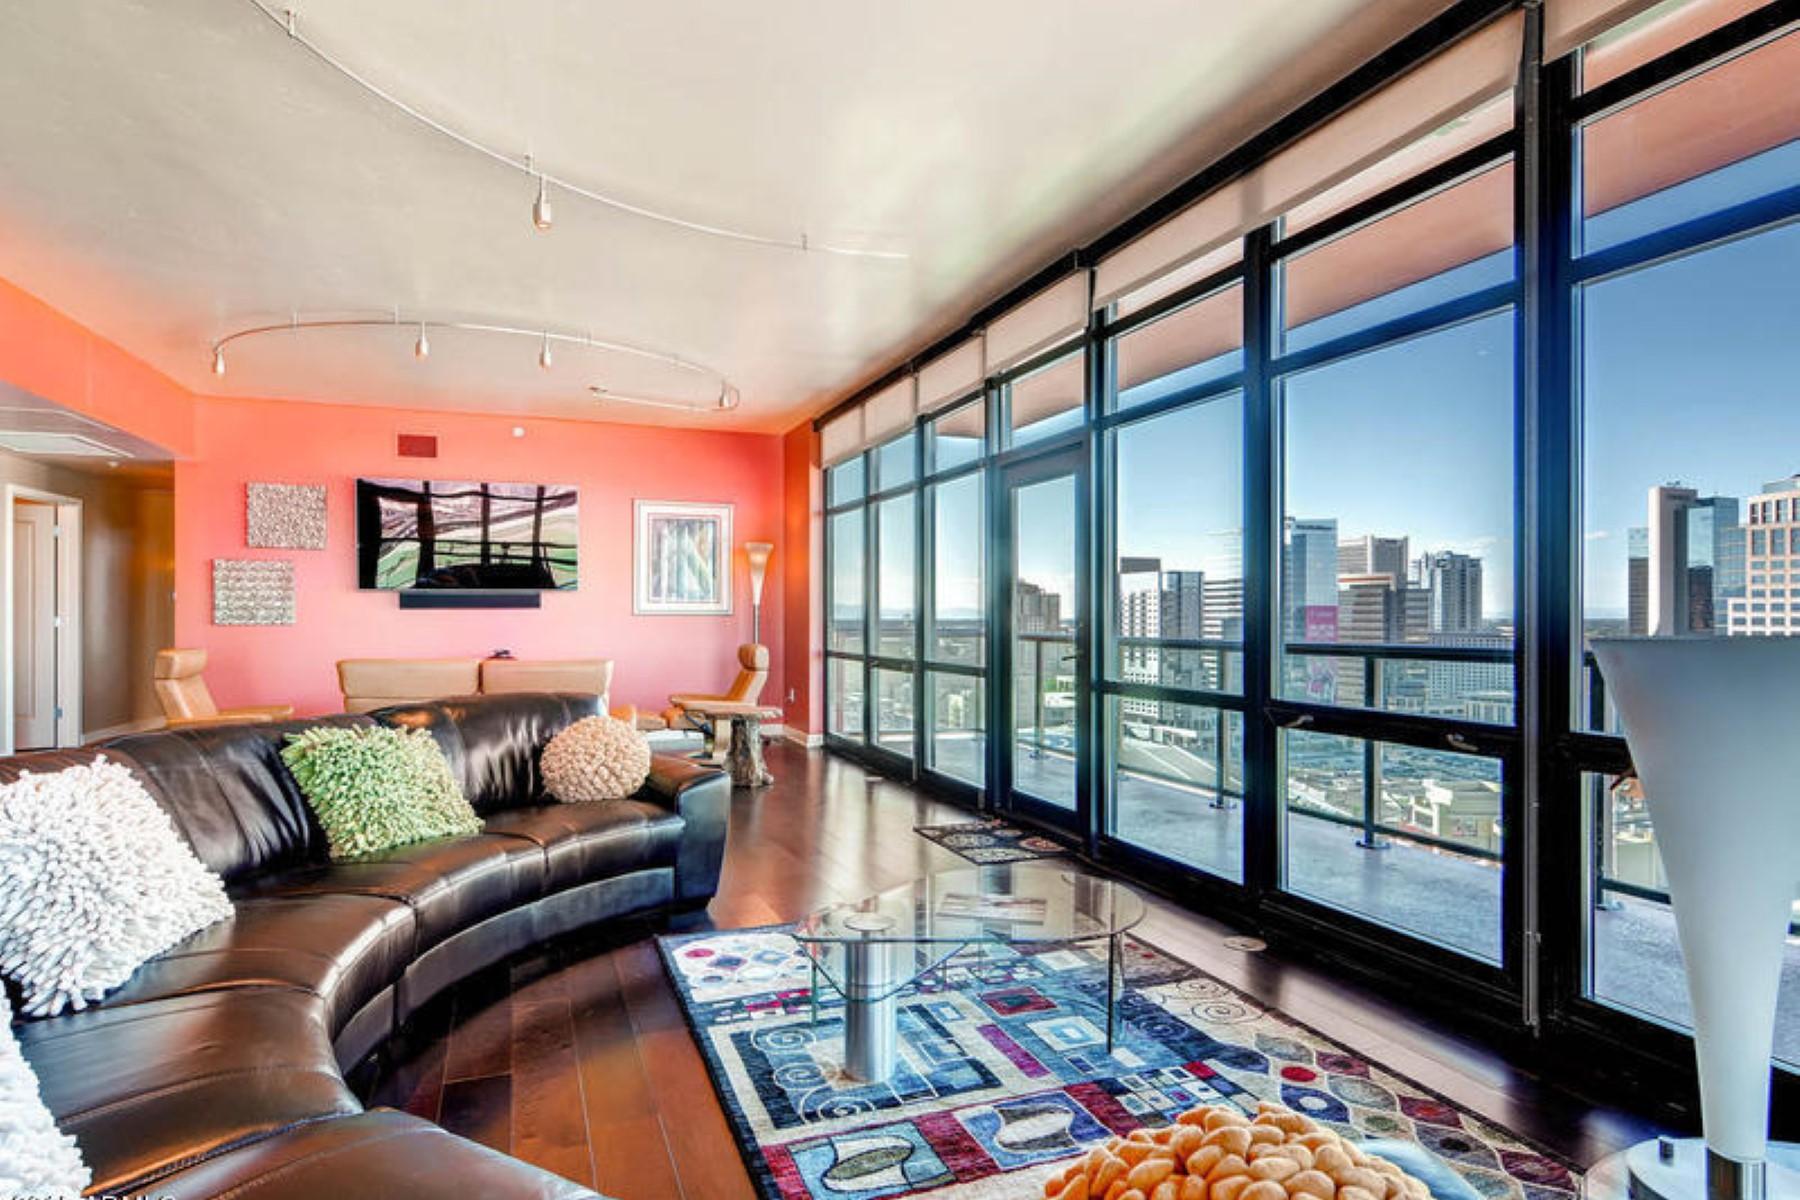 Wohnung für Verkauf beim Amazing penthouse on the top floor and right across the street from a ballpark 310 S 4th St2014 2104 Phoenix, Arizona 85004 Vereinigte Staaten